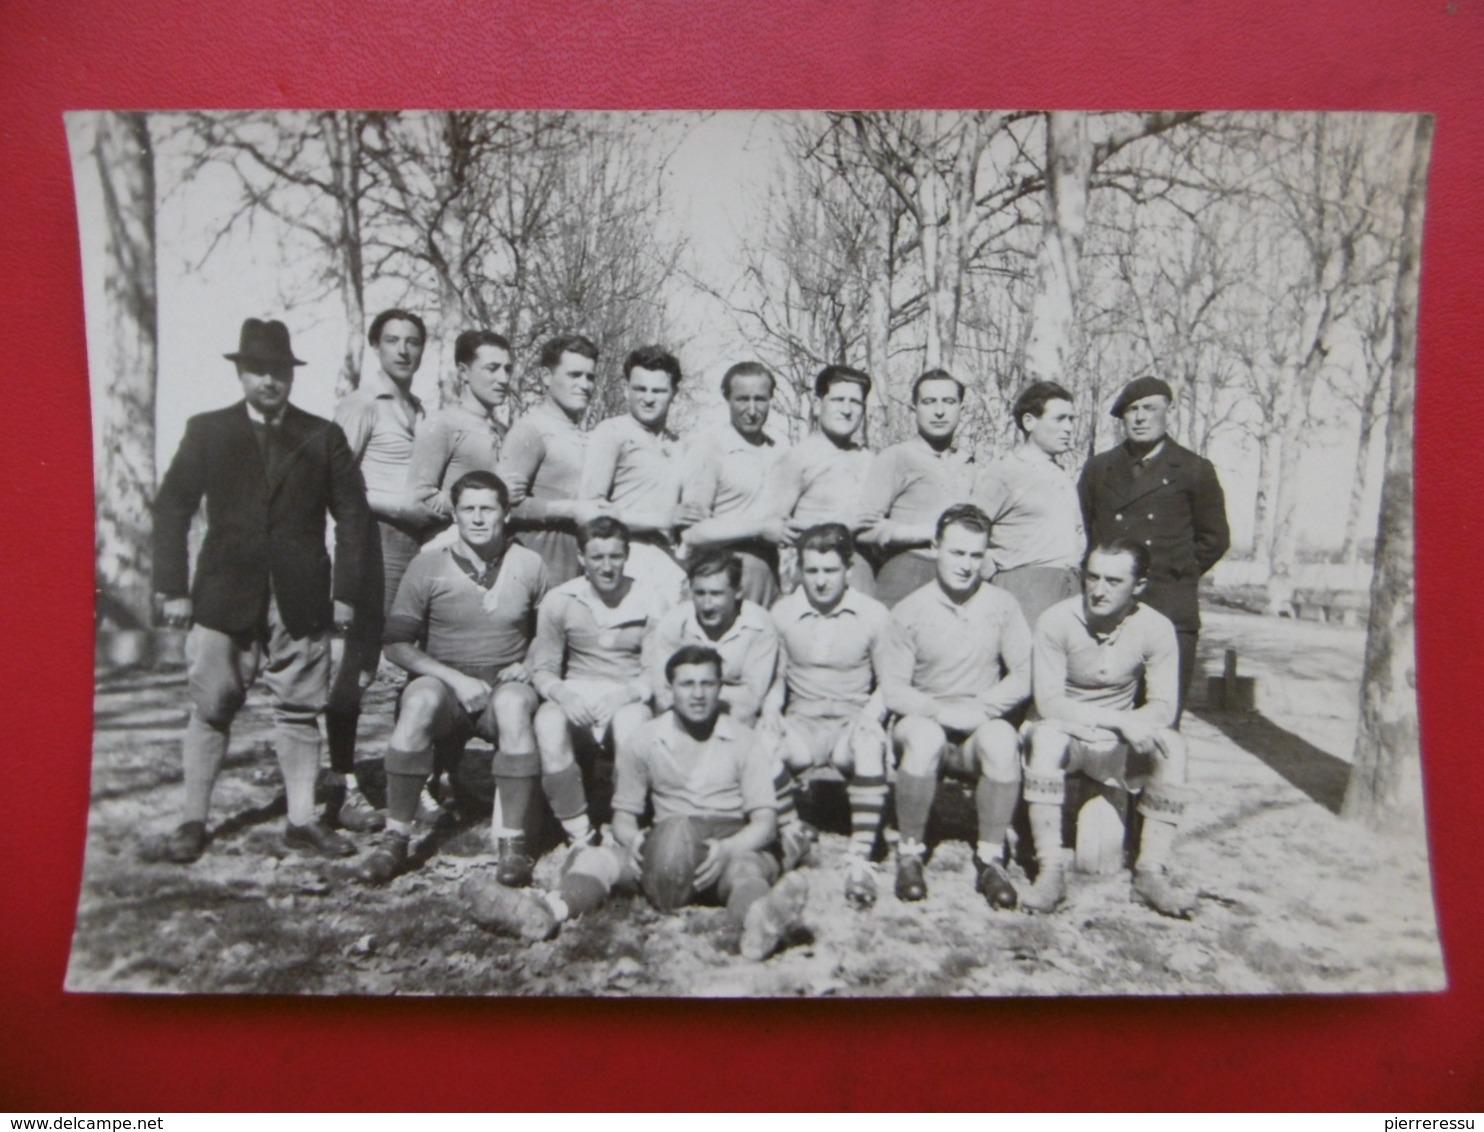 ISLE EN JOURDAIN EQUIPE DE RUGBY 1944 CARTE PHOTO - Rugby